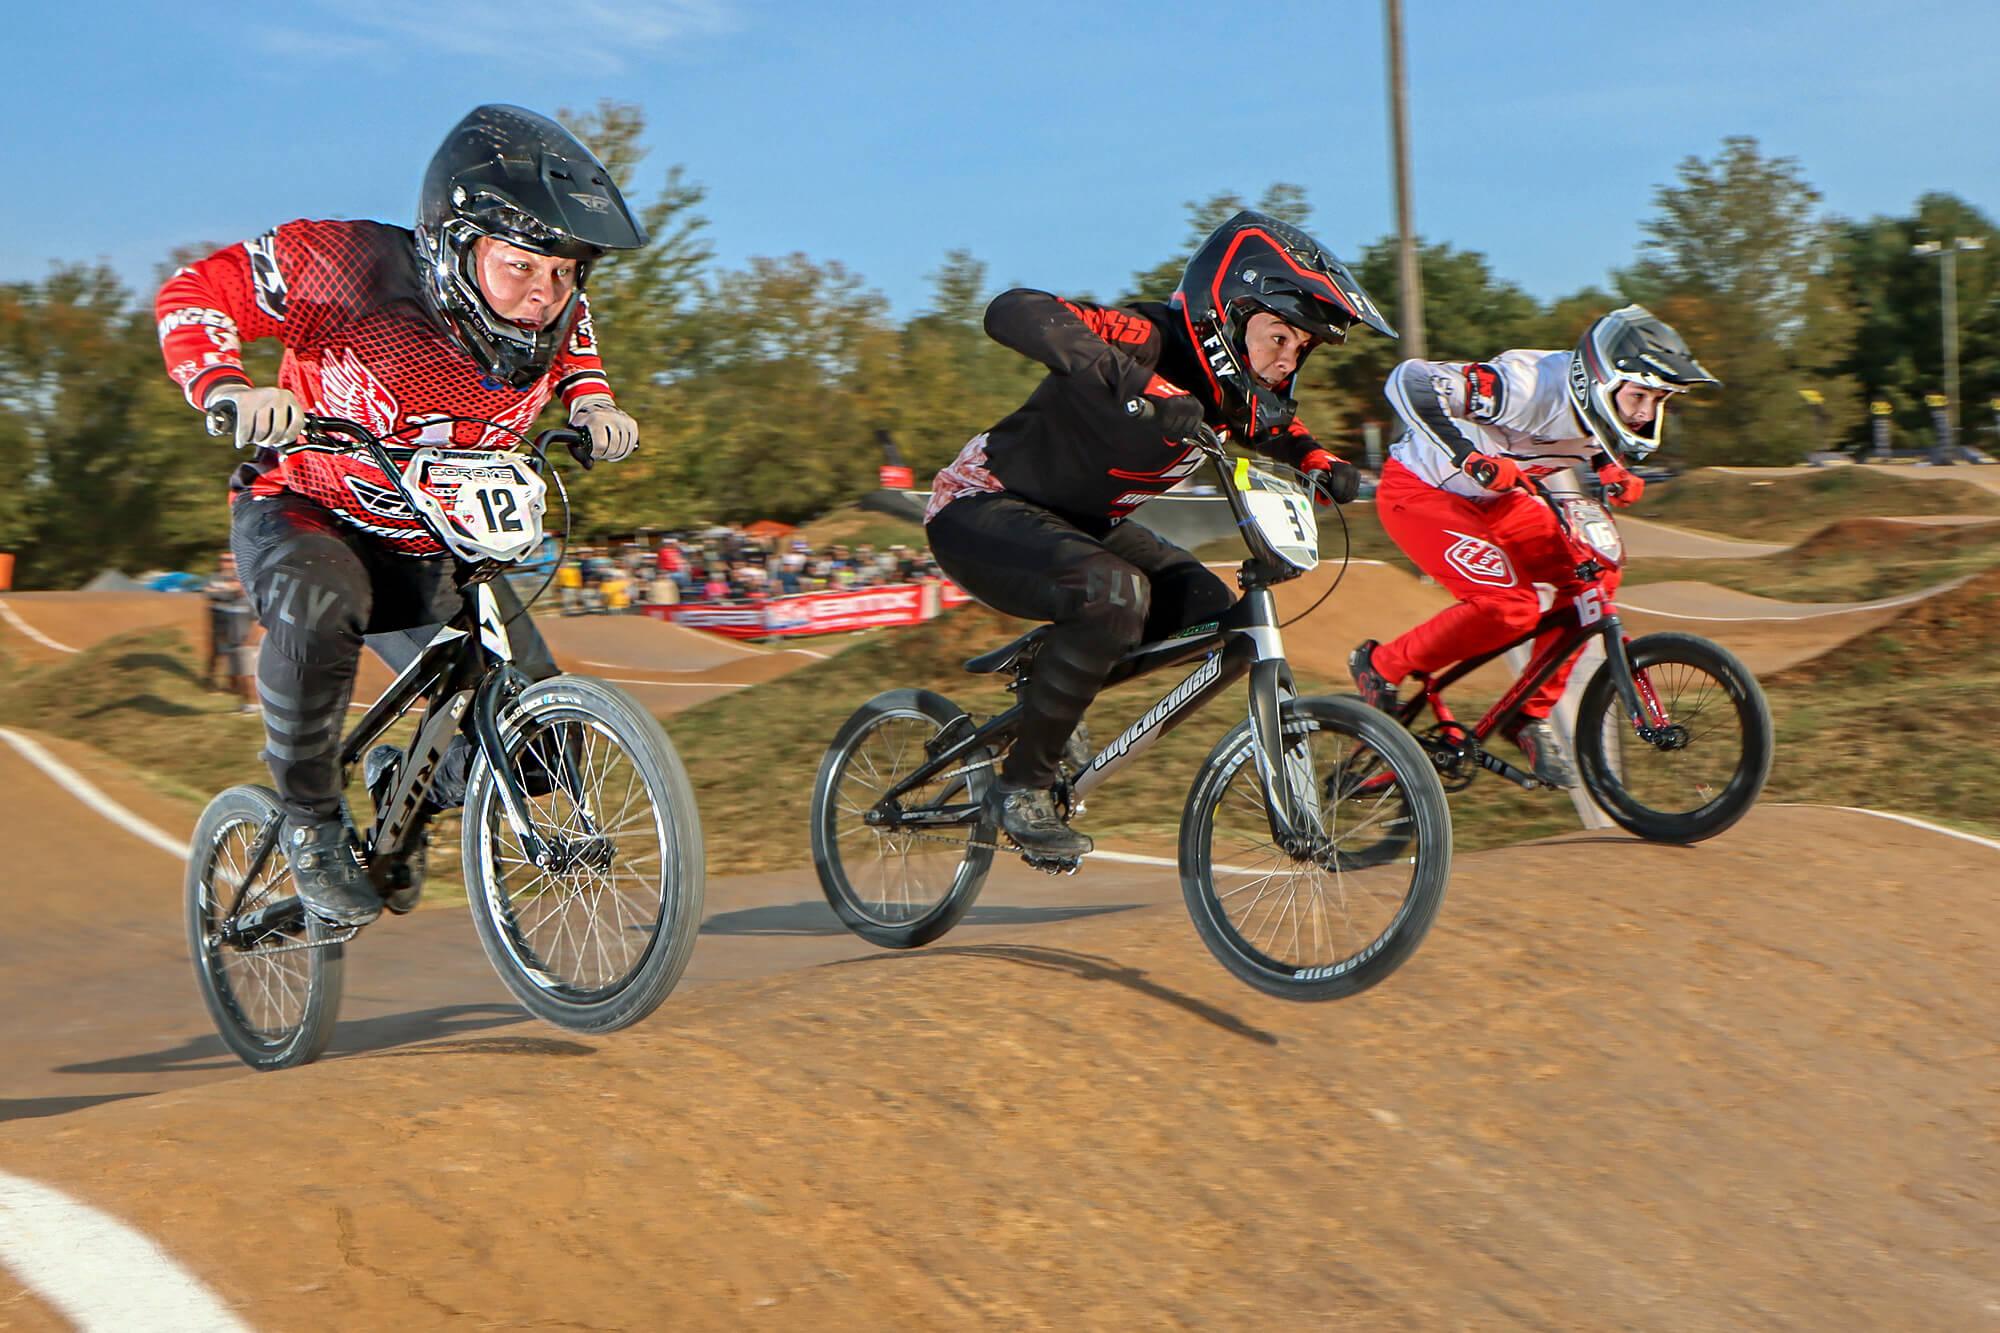 USA BMX Derby City 2020 - Jerry Landrum - 0216-2000FX